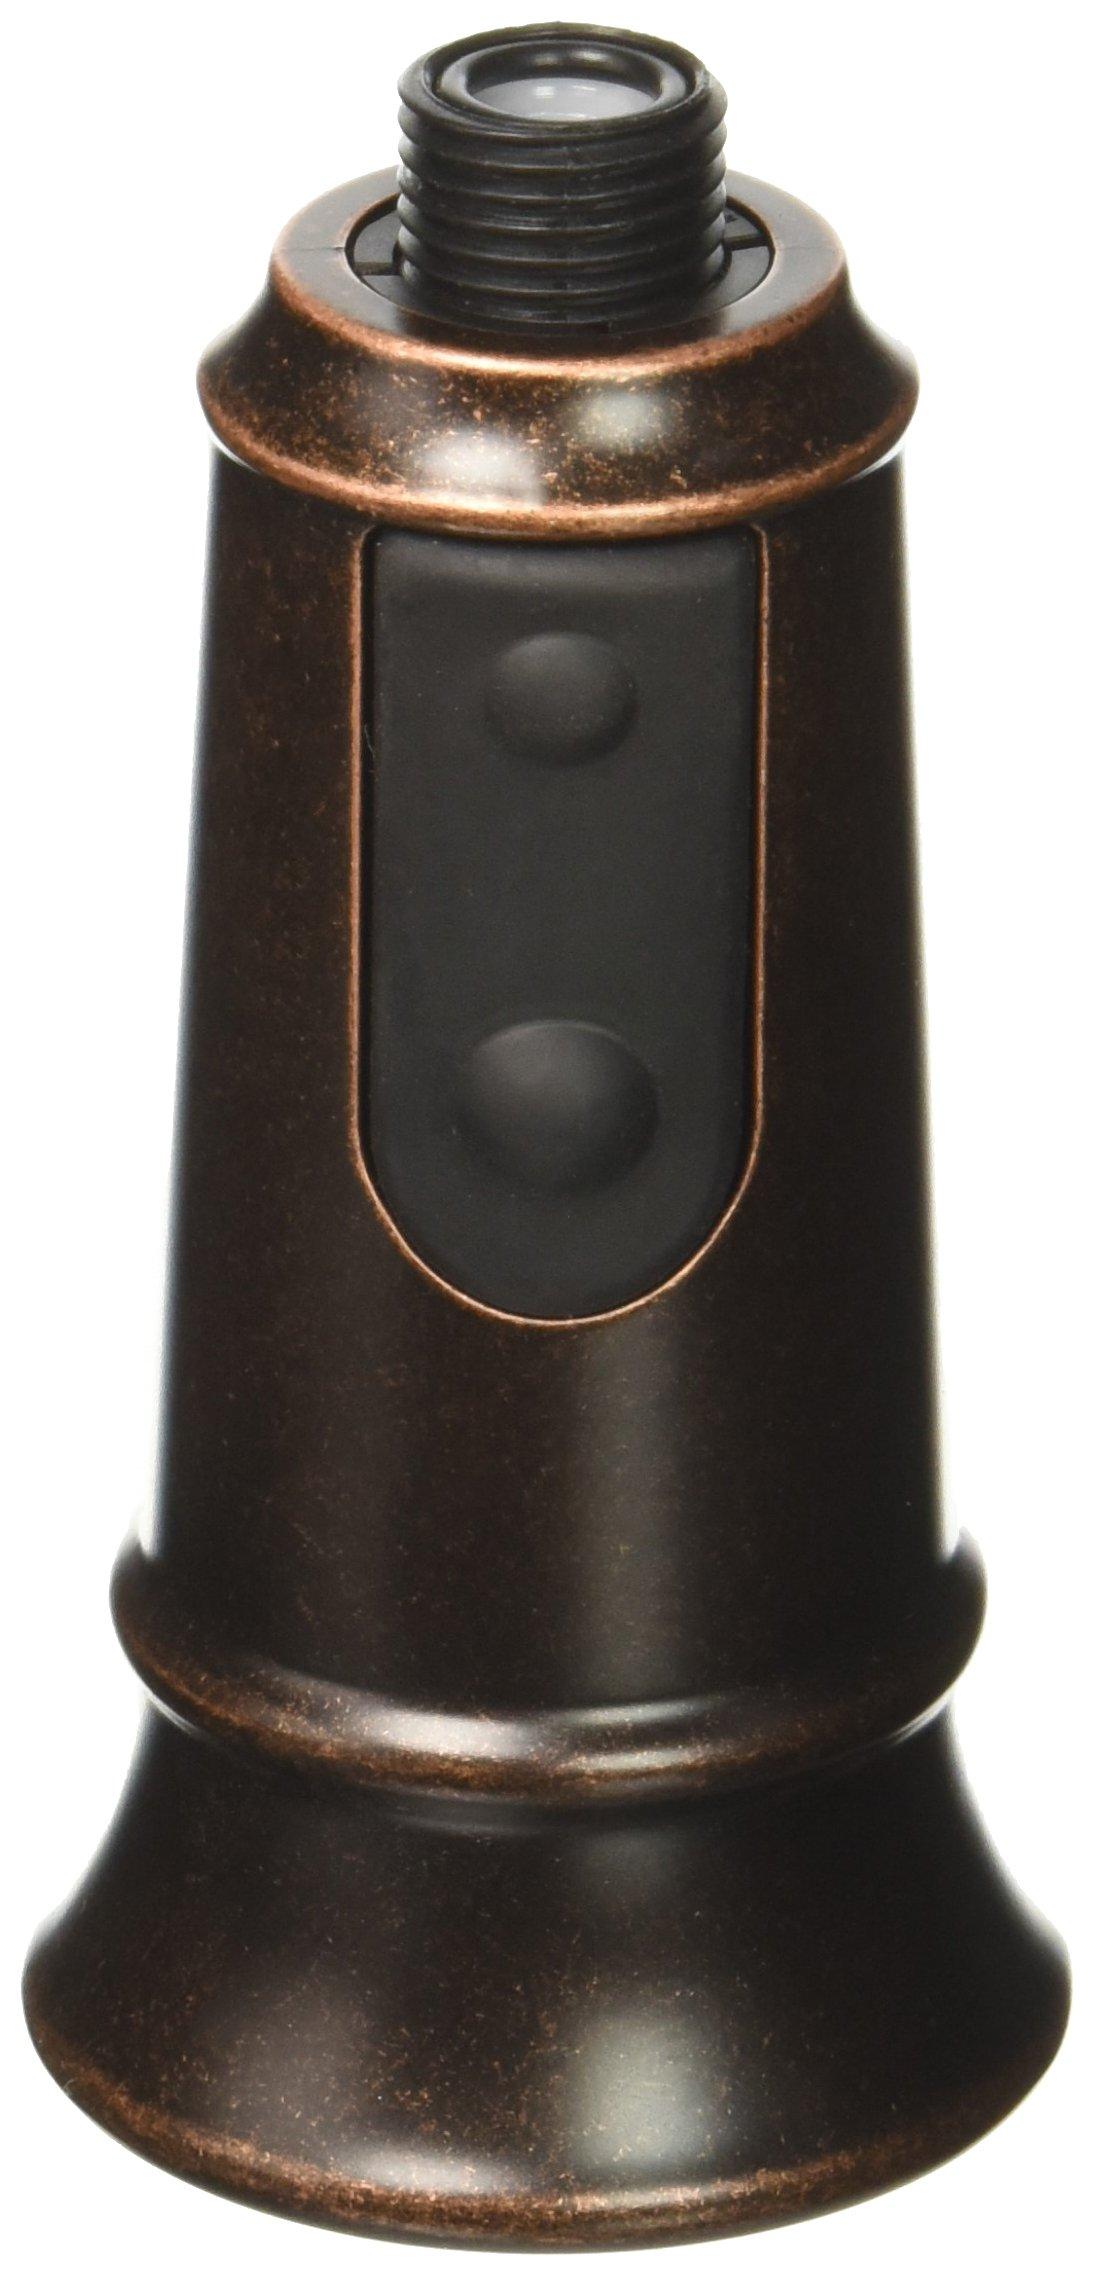 Moen 134742orb Handle Kit, Oil Rubbed Bronze by Moen